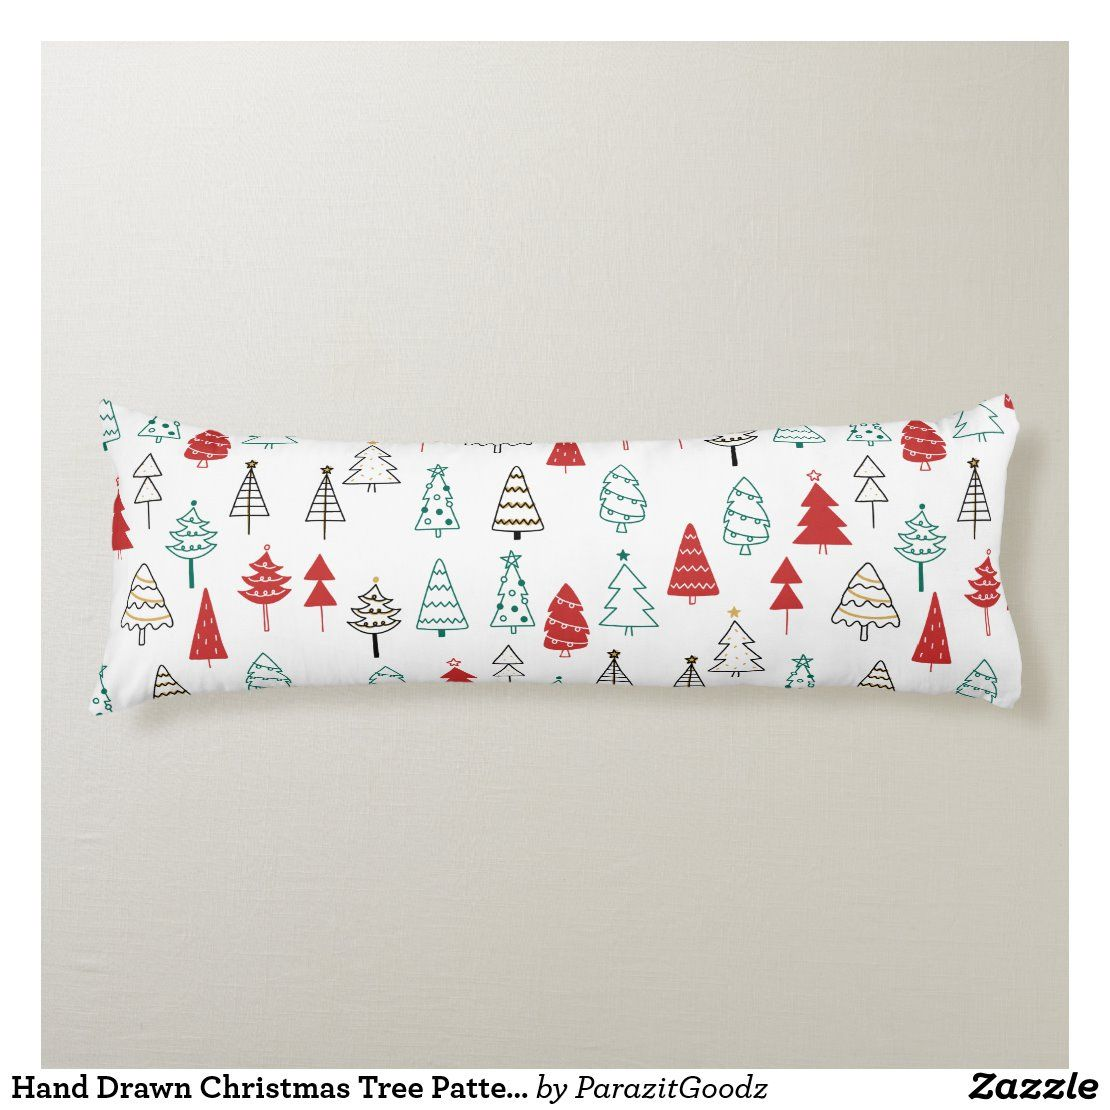 Hand Drawn Christmas Tree Pattern